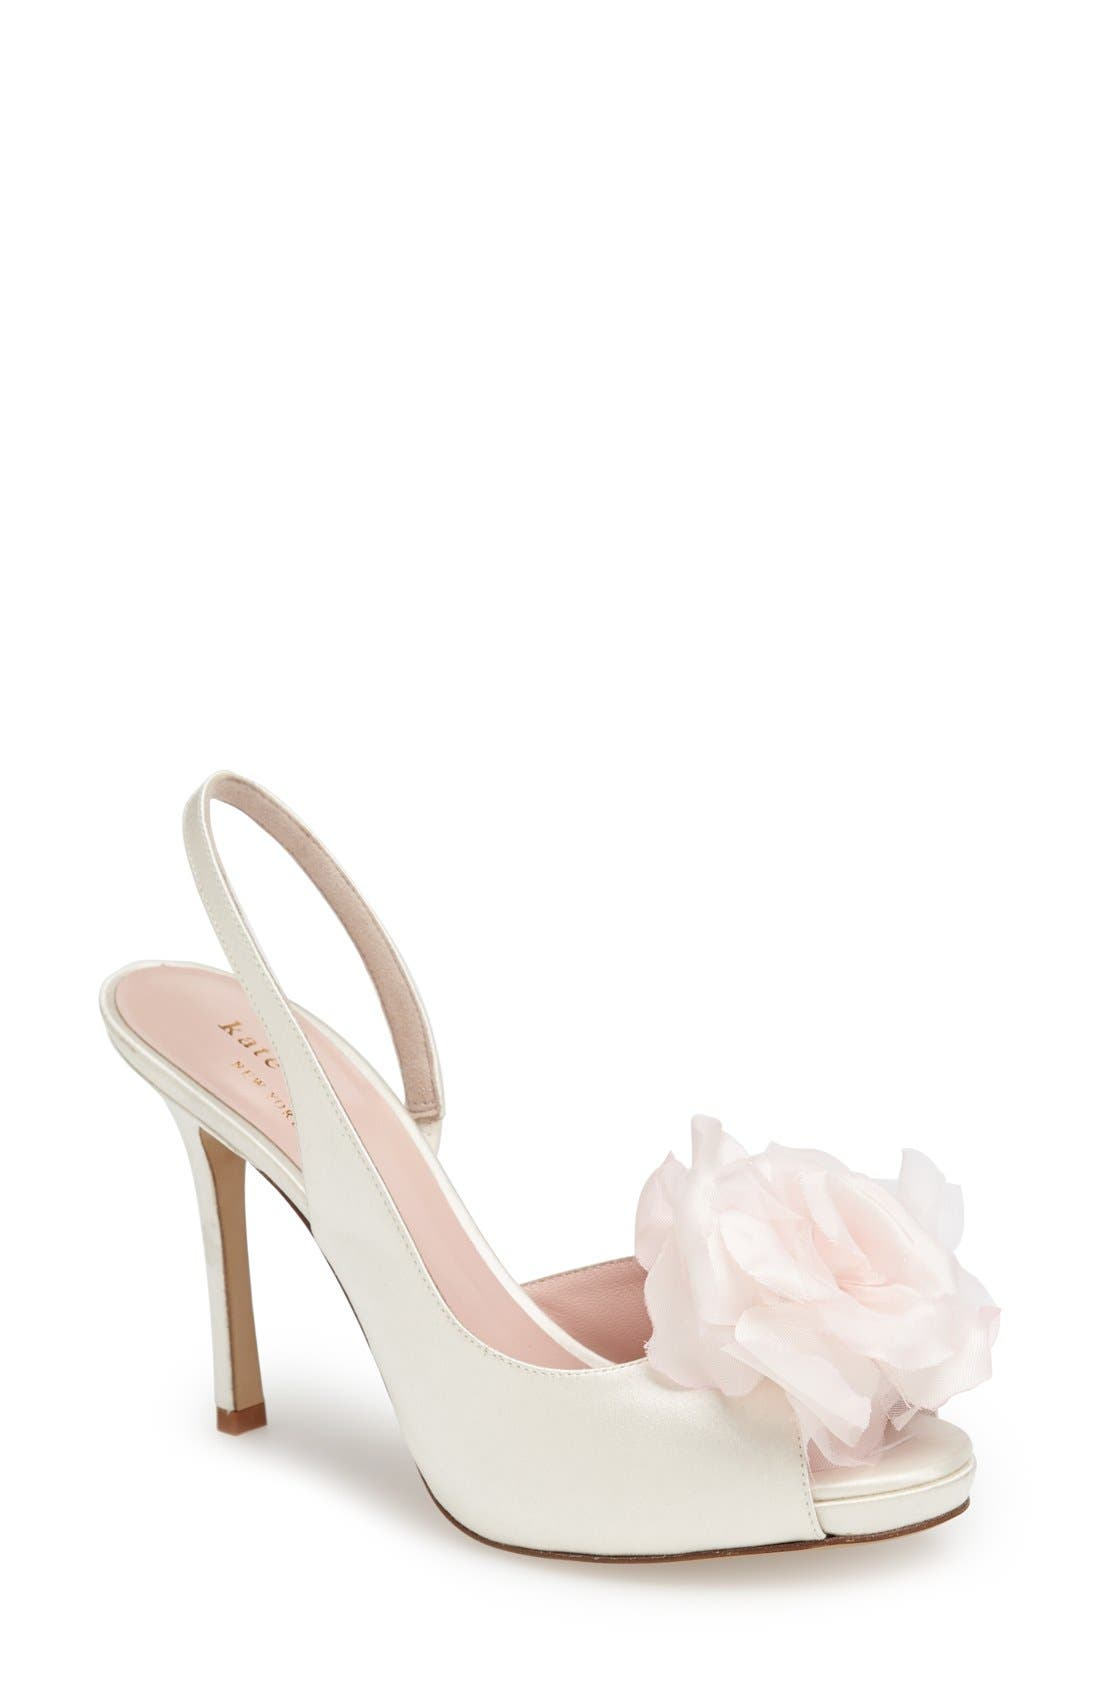 Alternate Image 1 Selected - kate spade new york 'camilla' high sandal (Women)